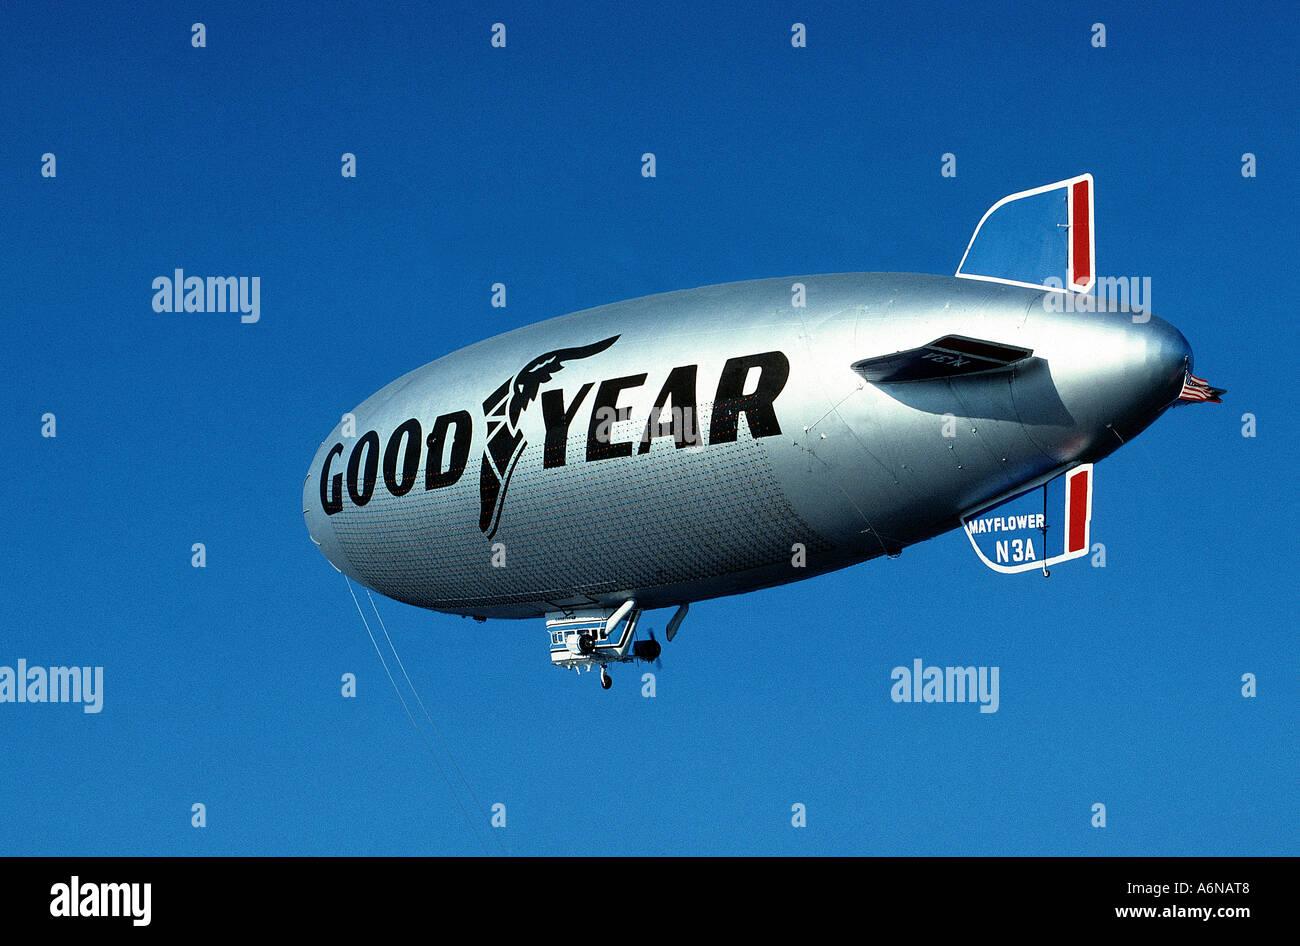 Goodyear Blimp Airship - Stock Image